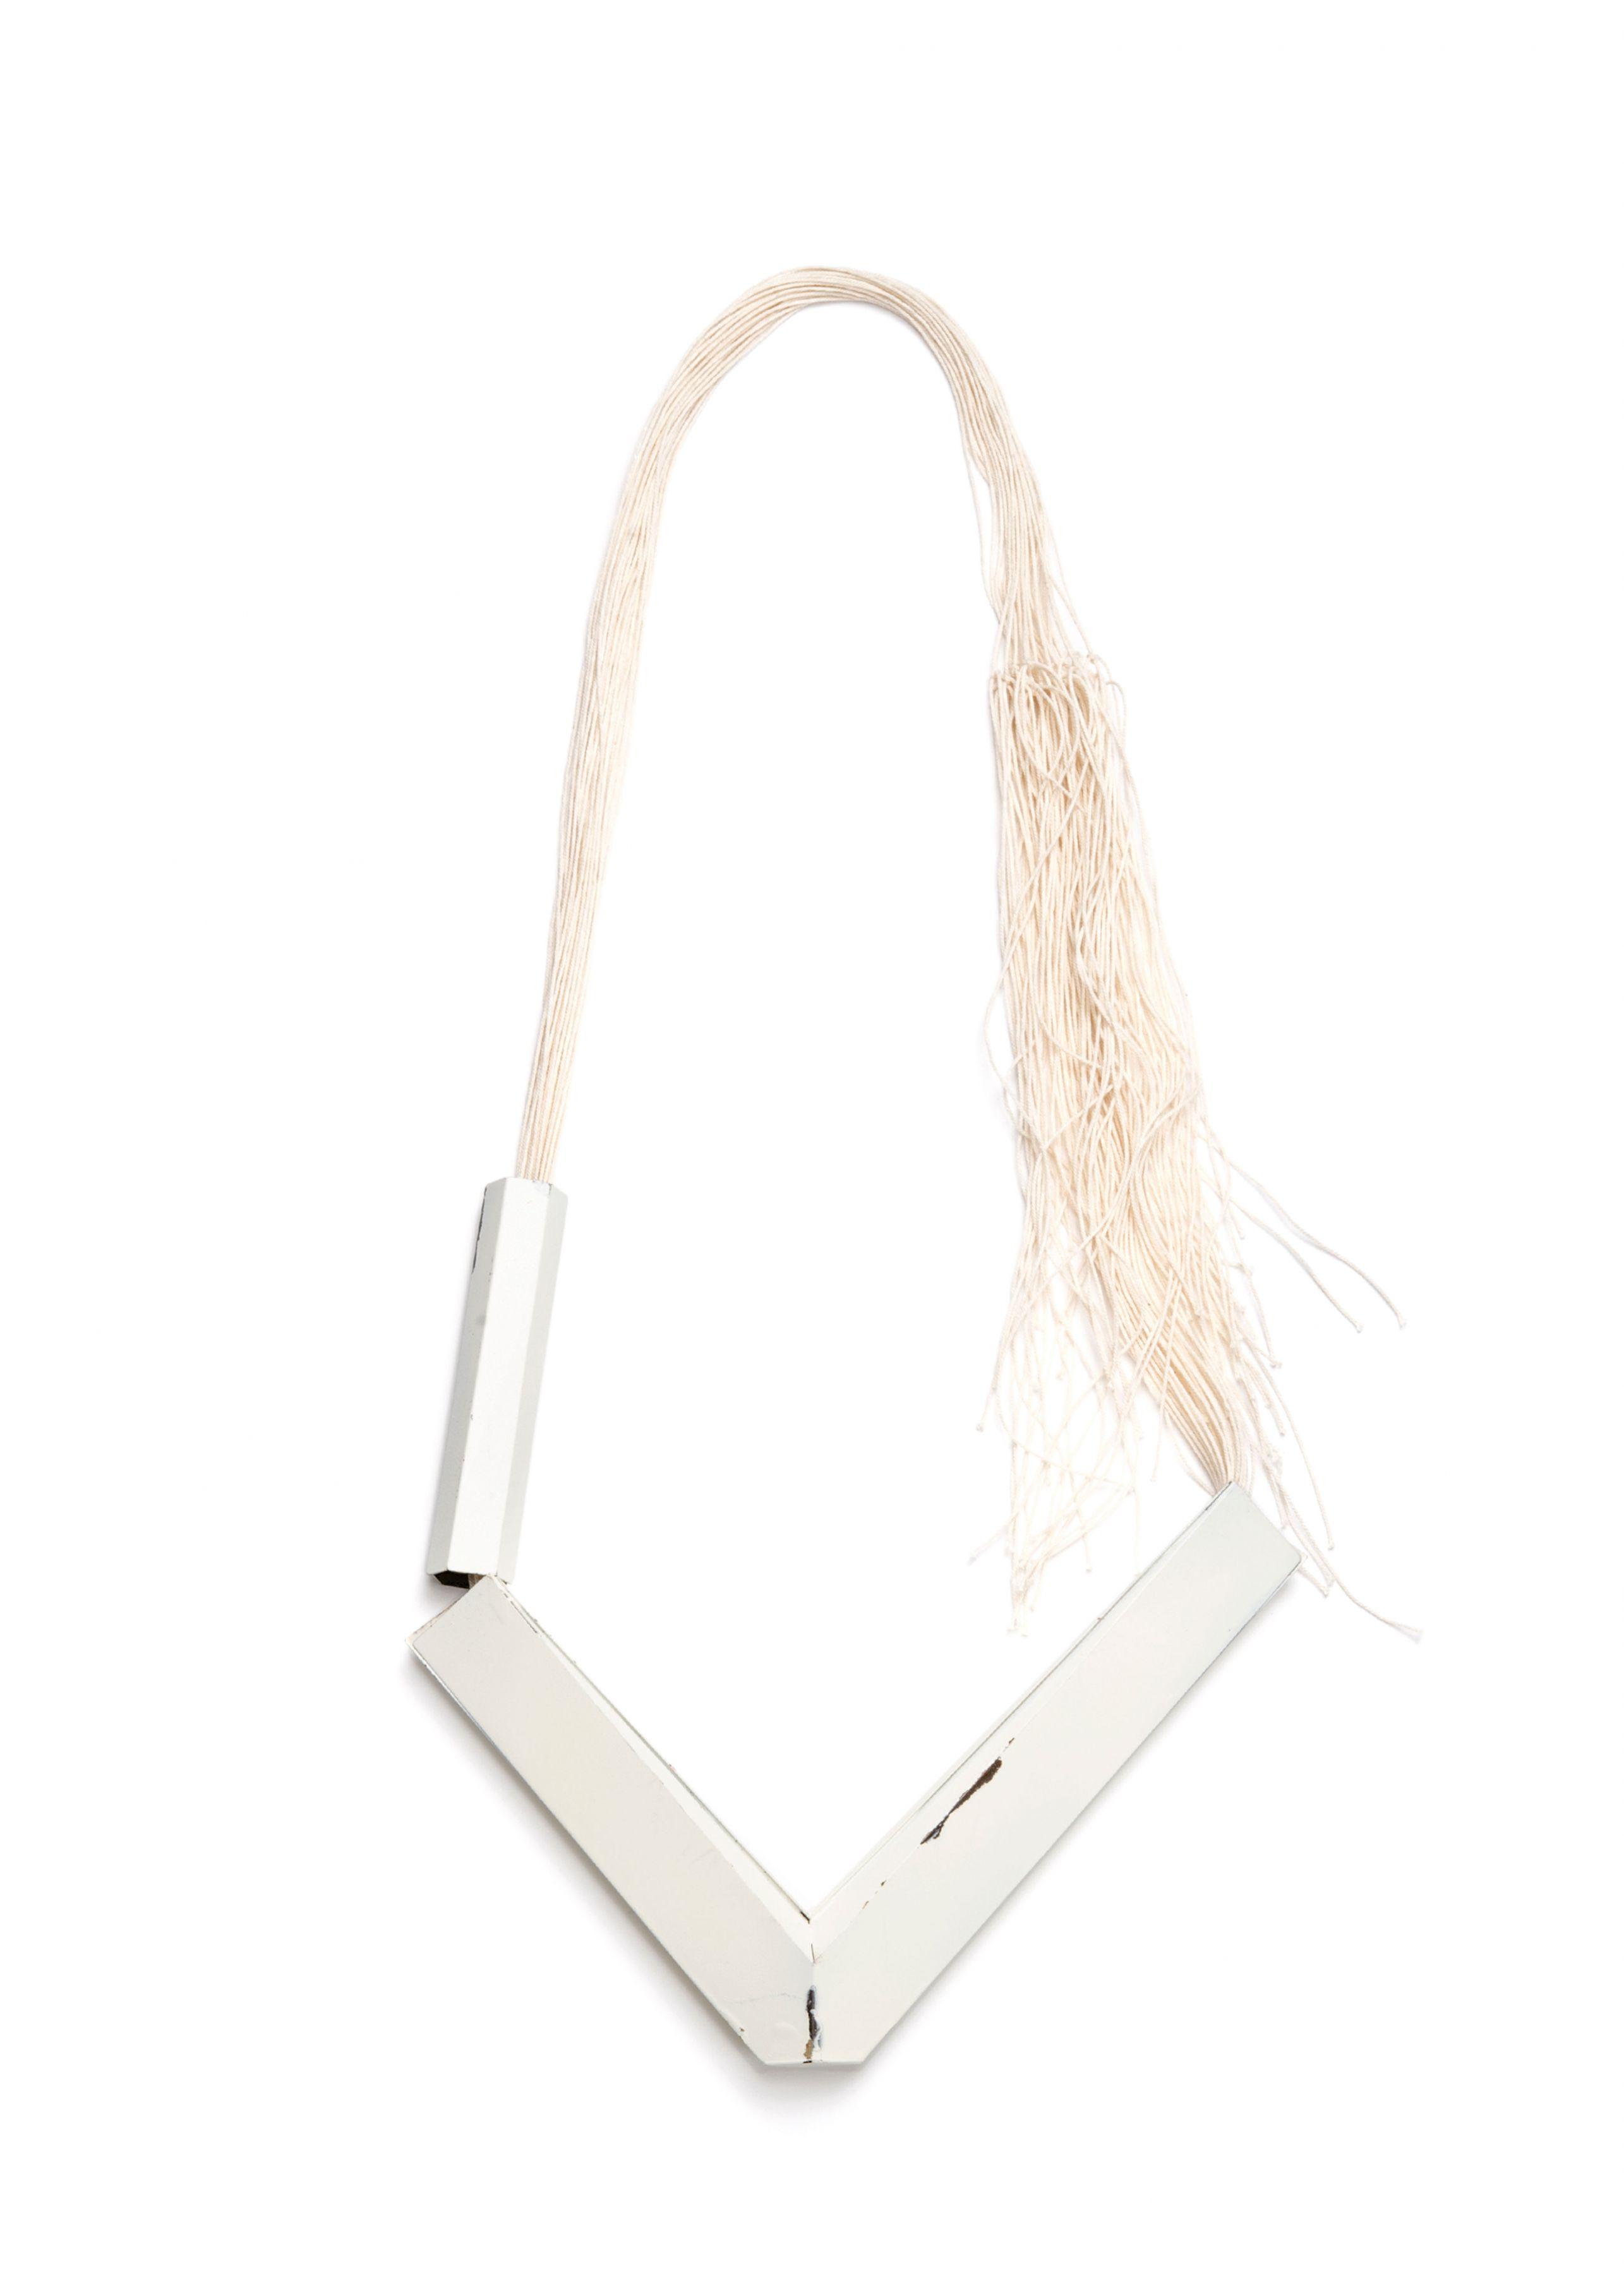 Sara Borgegard, necklace, steel, Swedish, art jewelry